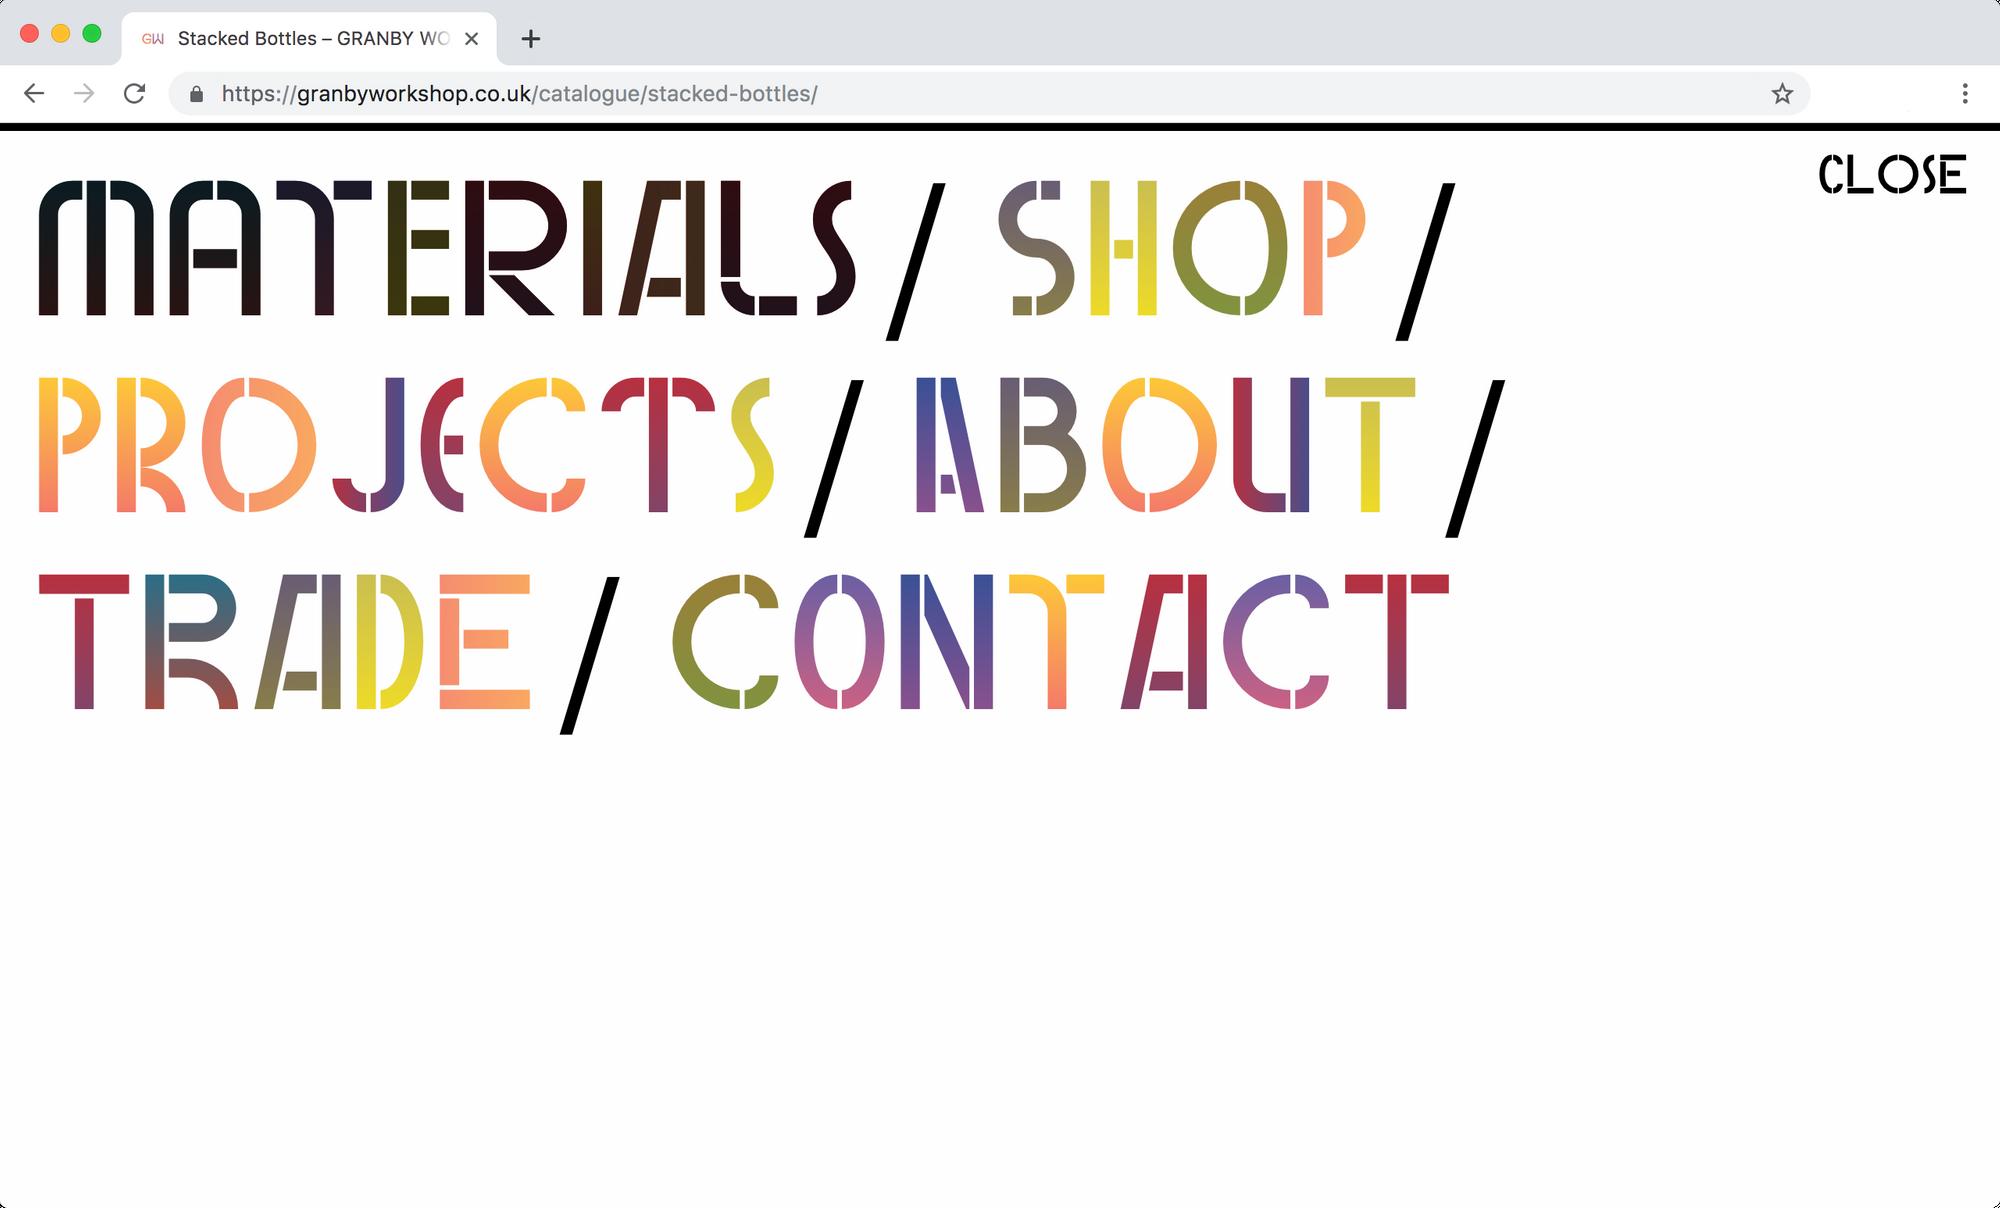 Screen grab of Granby Workshop website